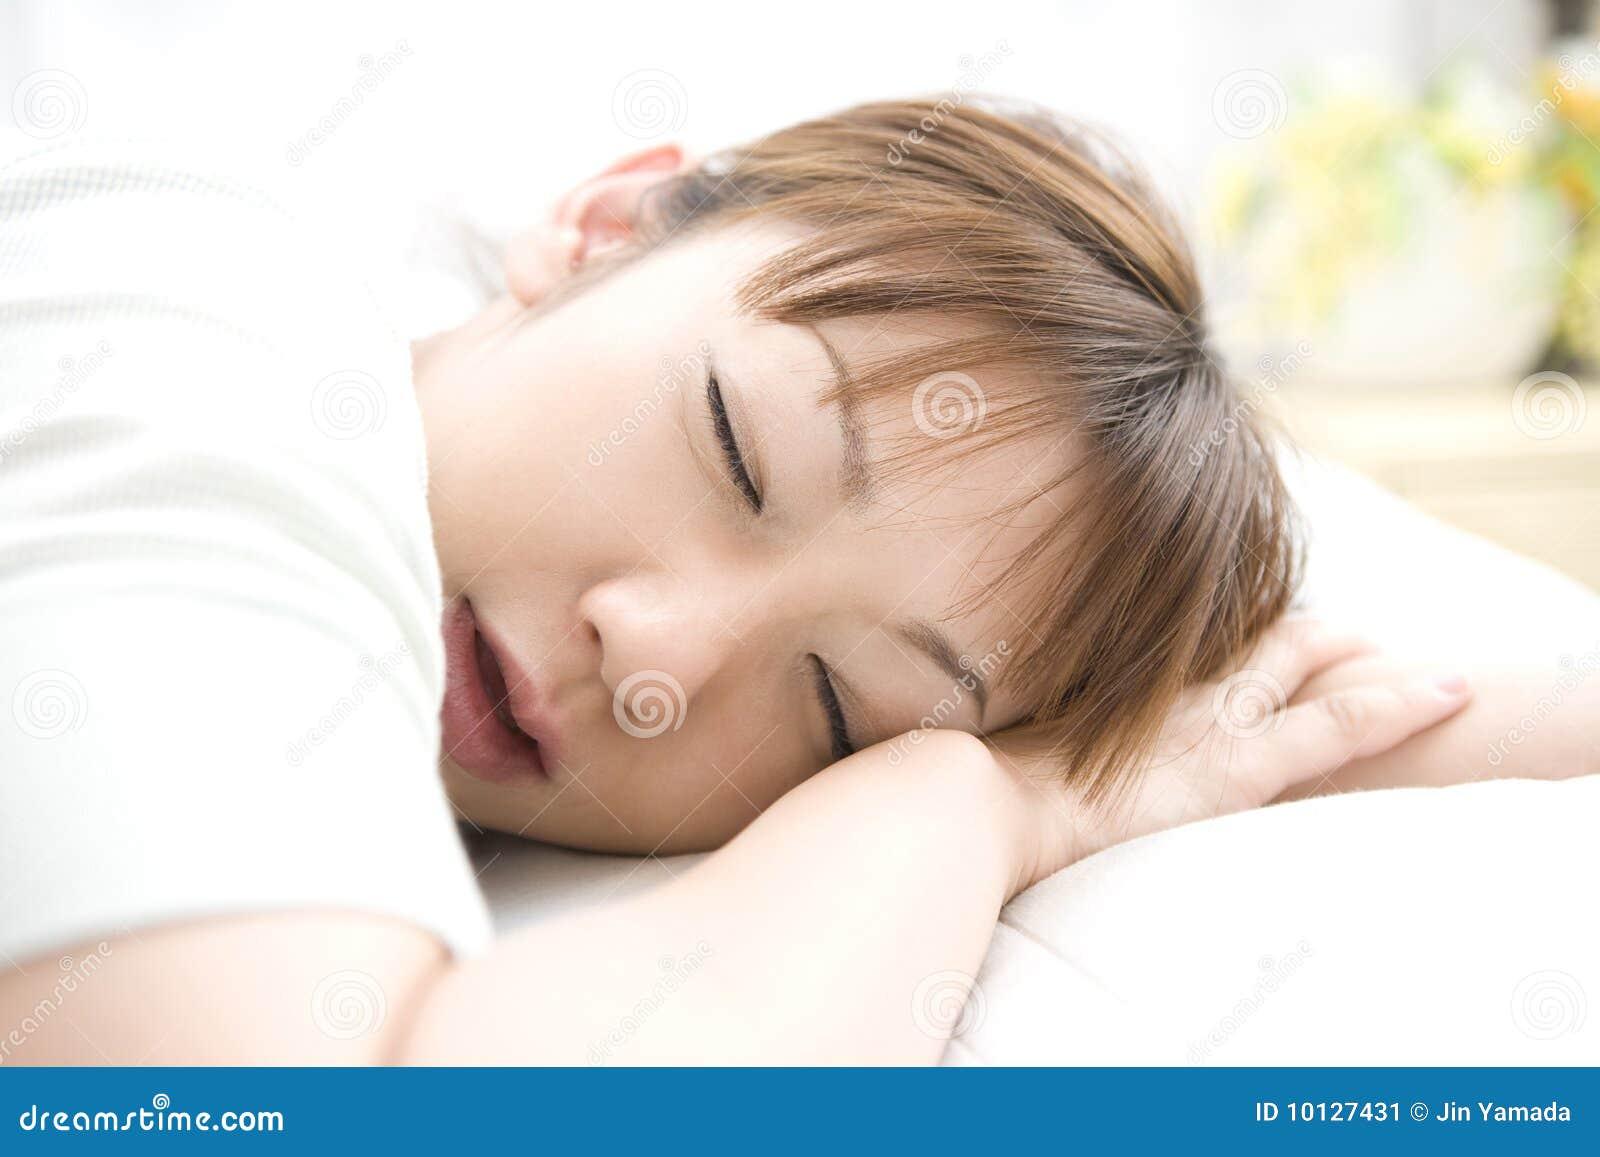 Sleeping Face Of Japanese Woman Stock Image - Image: 10127431